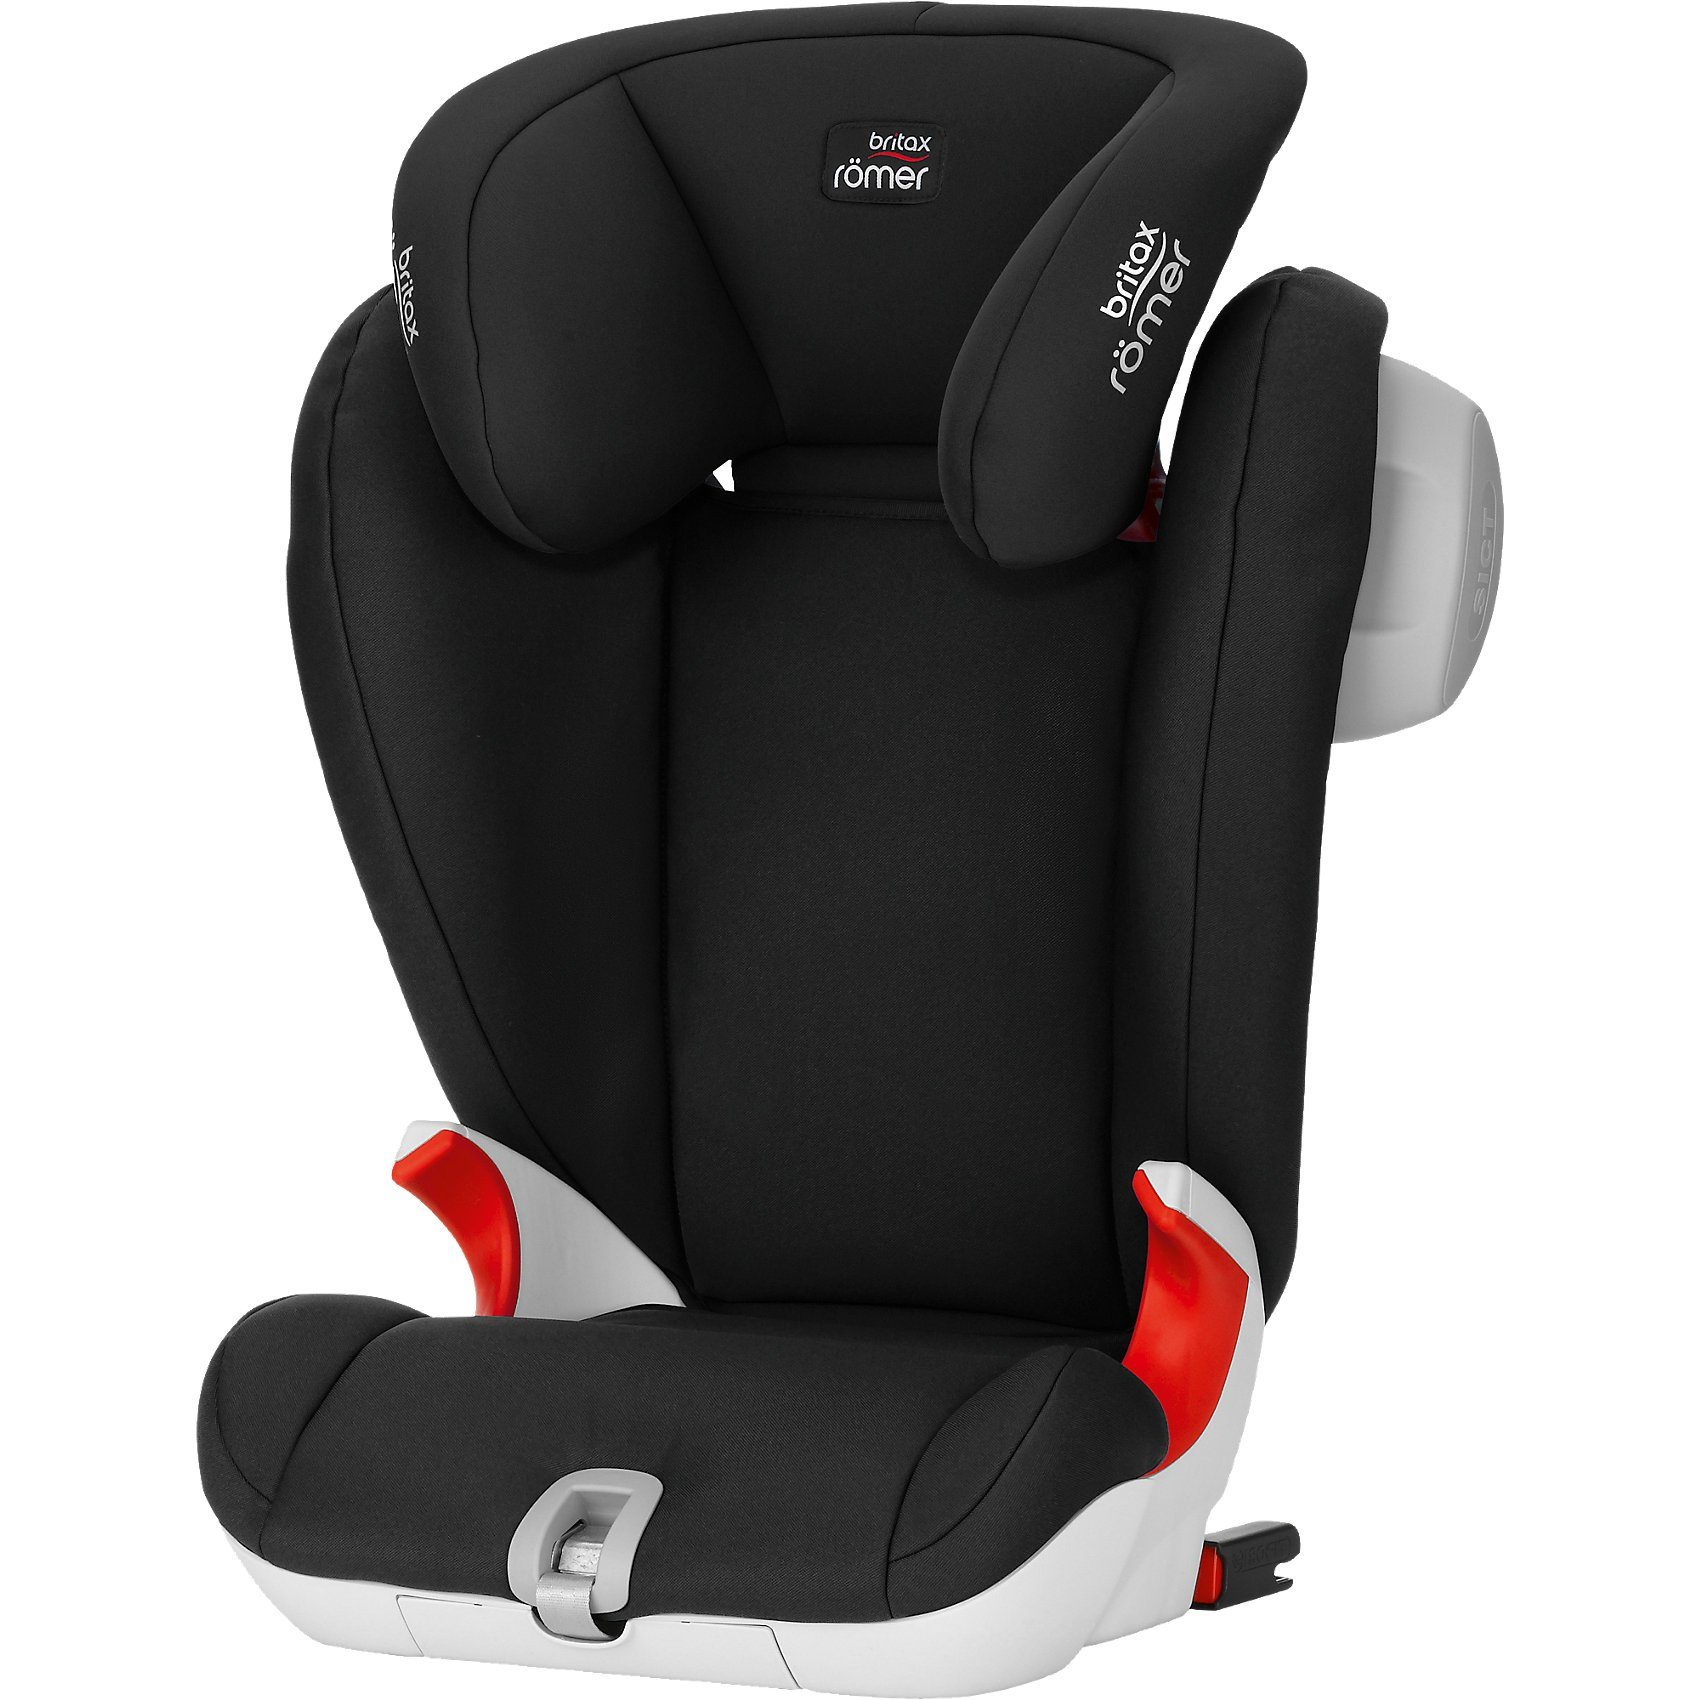 Britax Römer Auto-Kindersitz Kidfix SL Sict, Cosmos Black, 2018